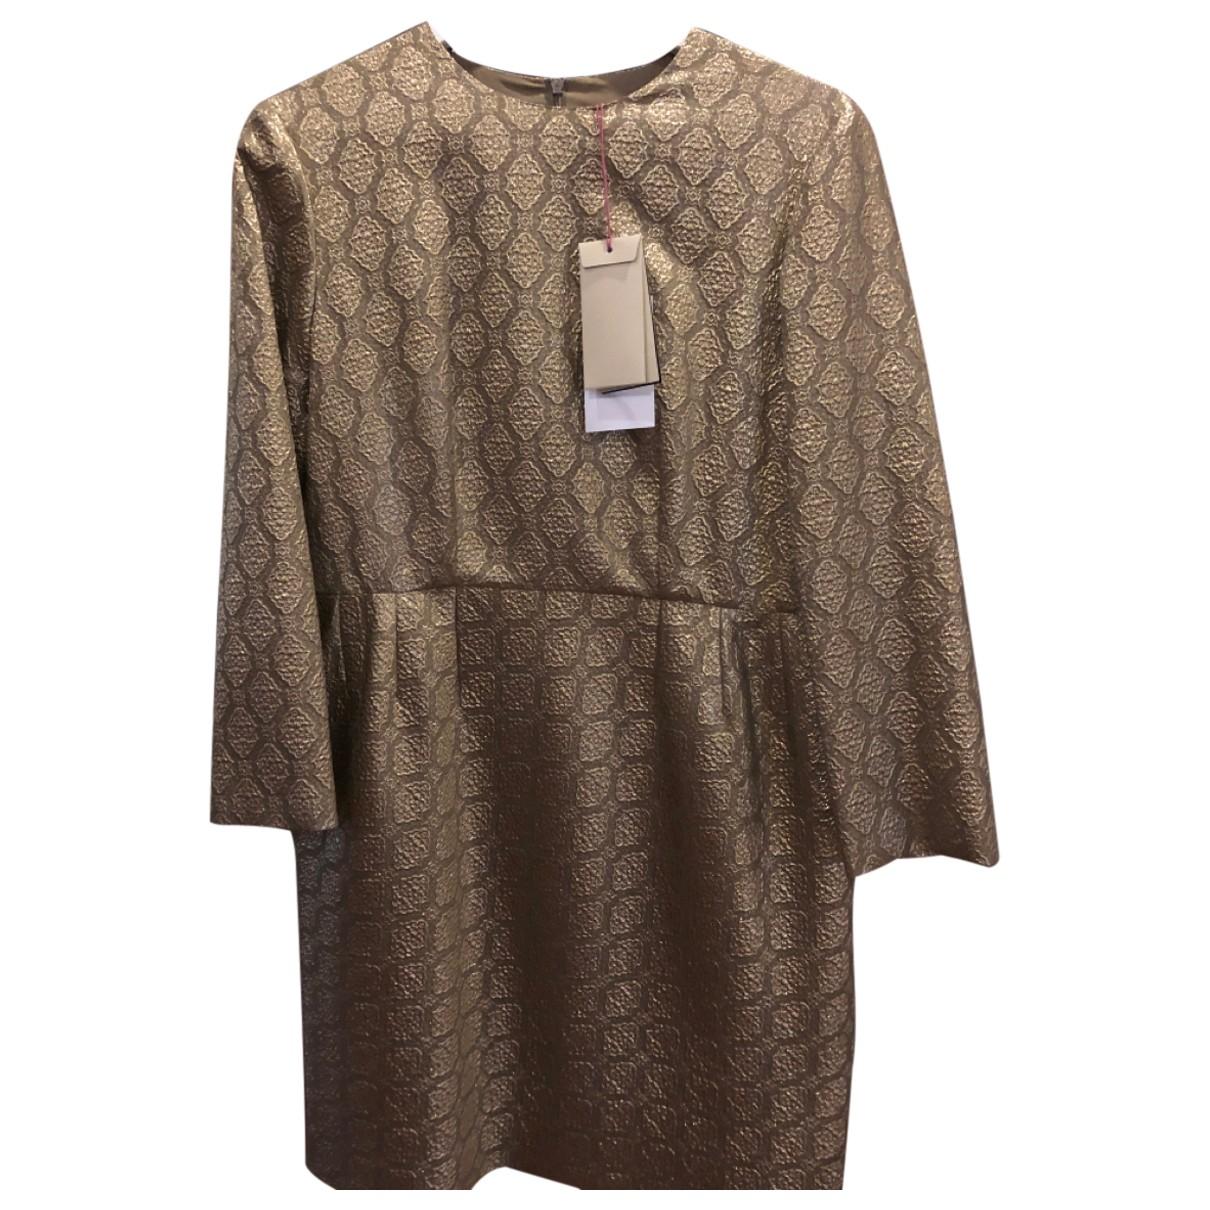 Stella Mccartney N Metallic dress for Women S International